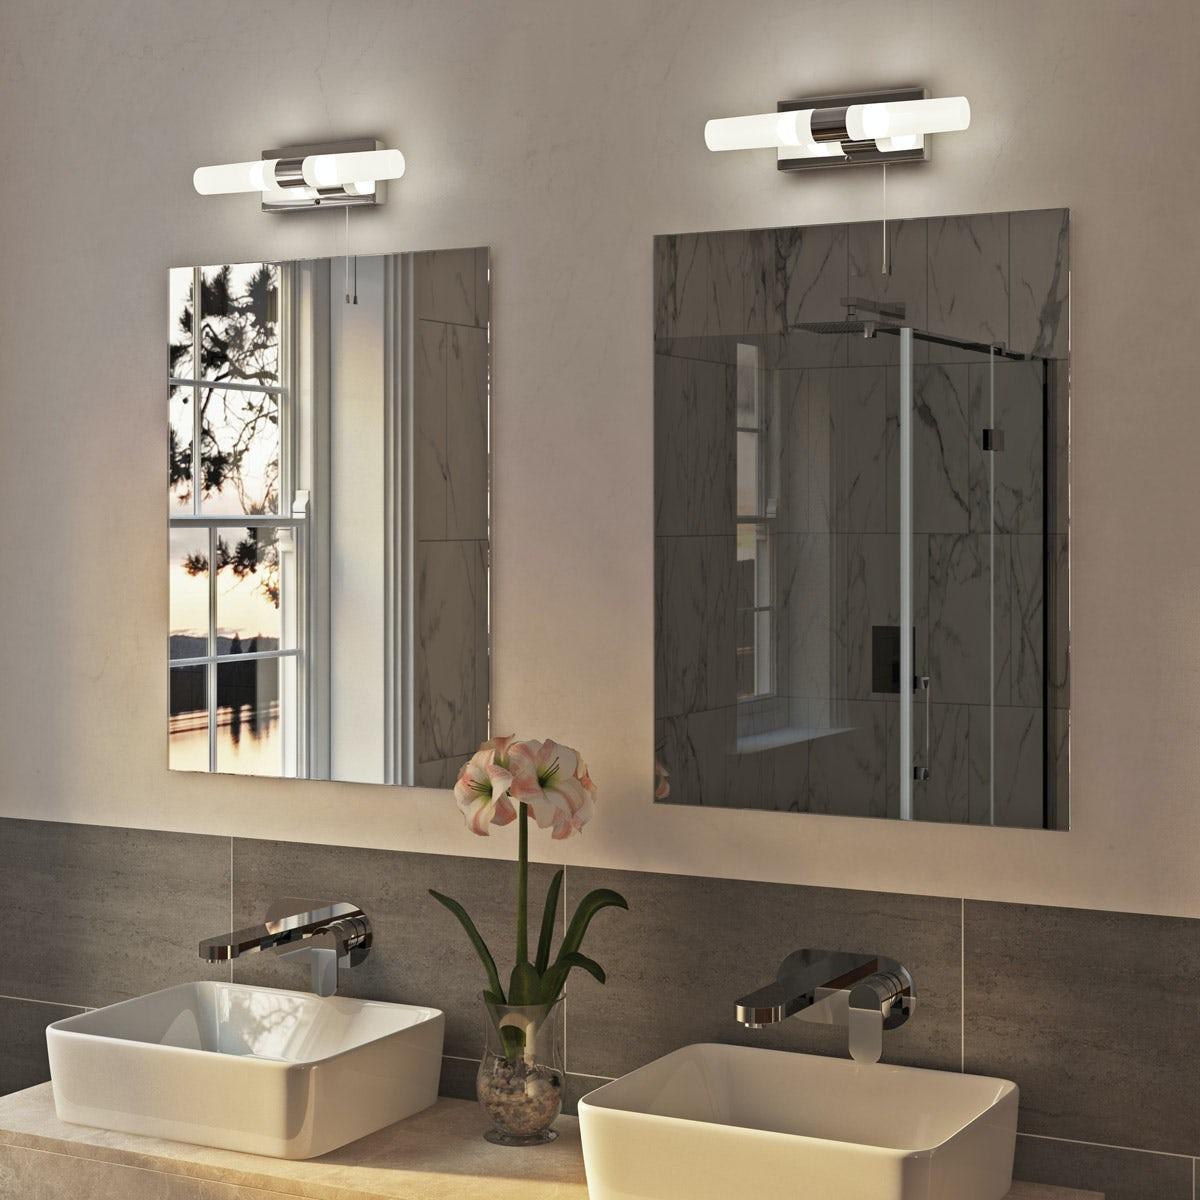 Arinna 3 light over mirror bathroom light for Above mirror bathroom light